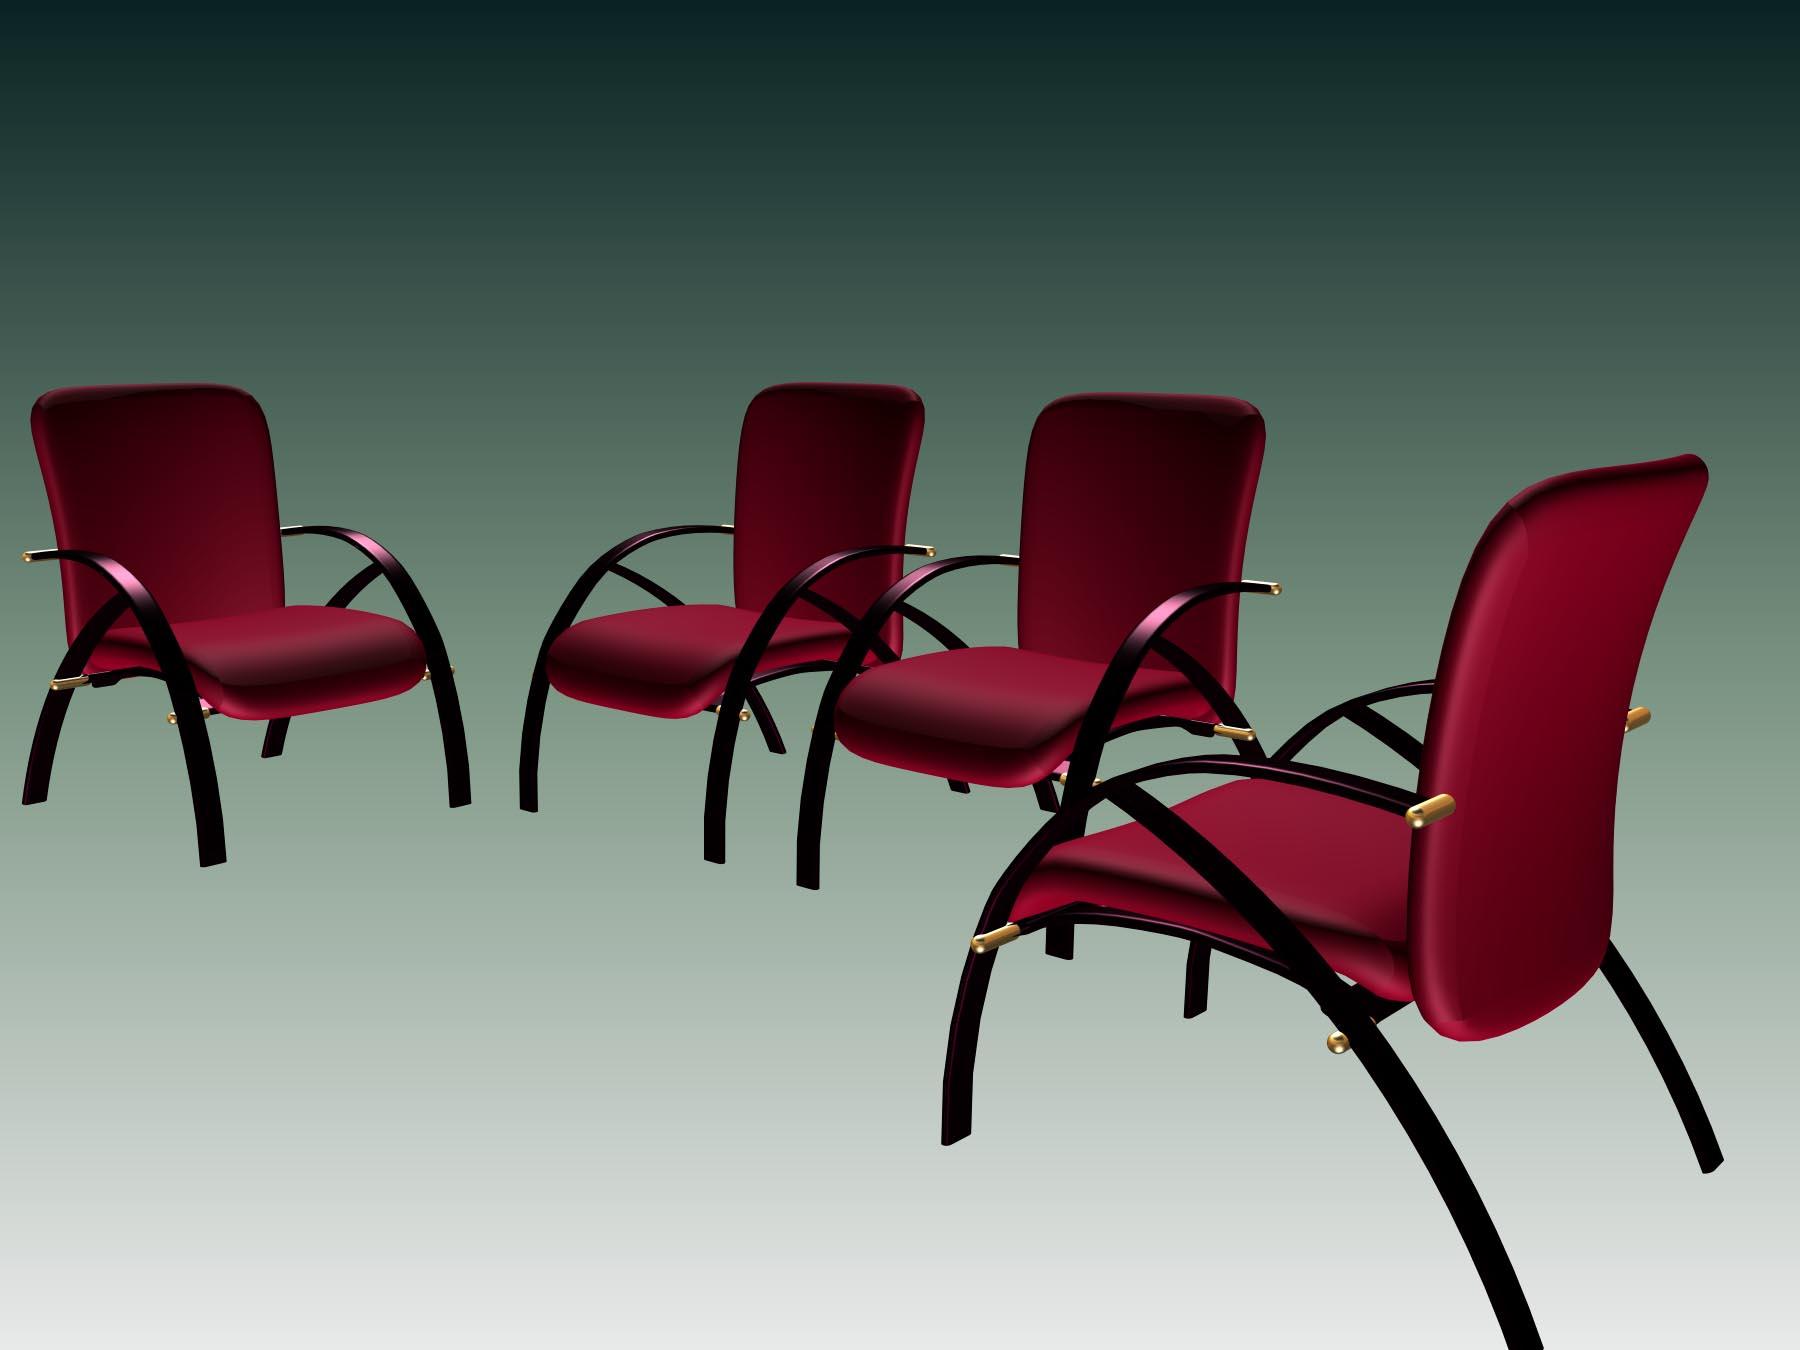 Office furniture 003-��24�� 3D Model